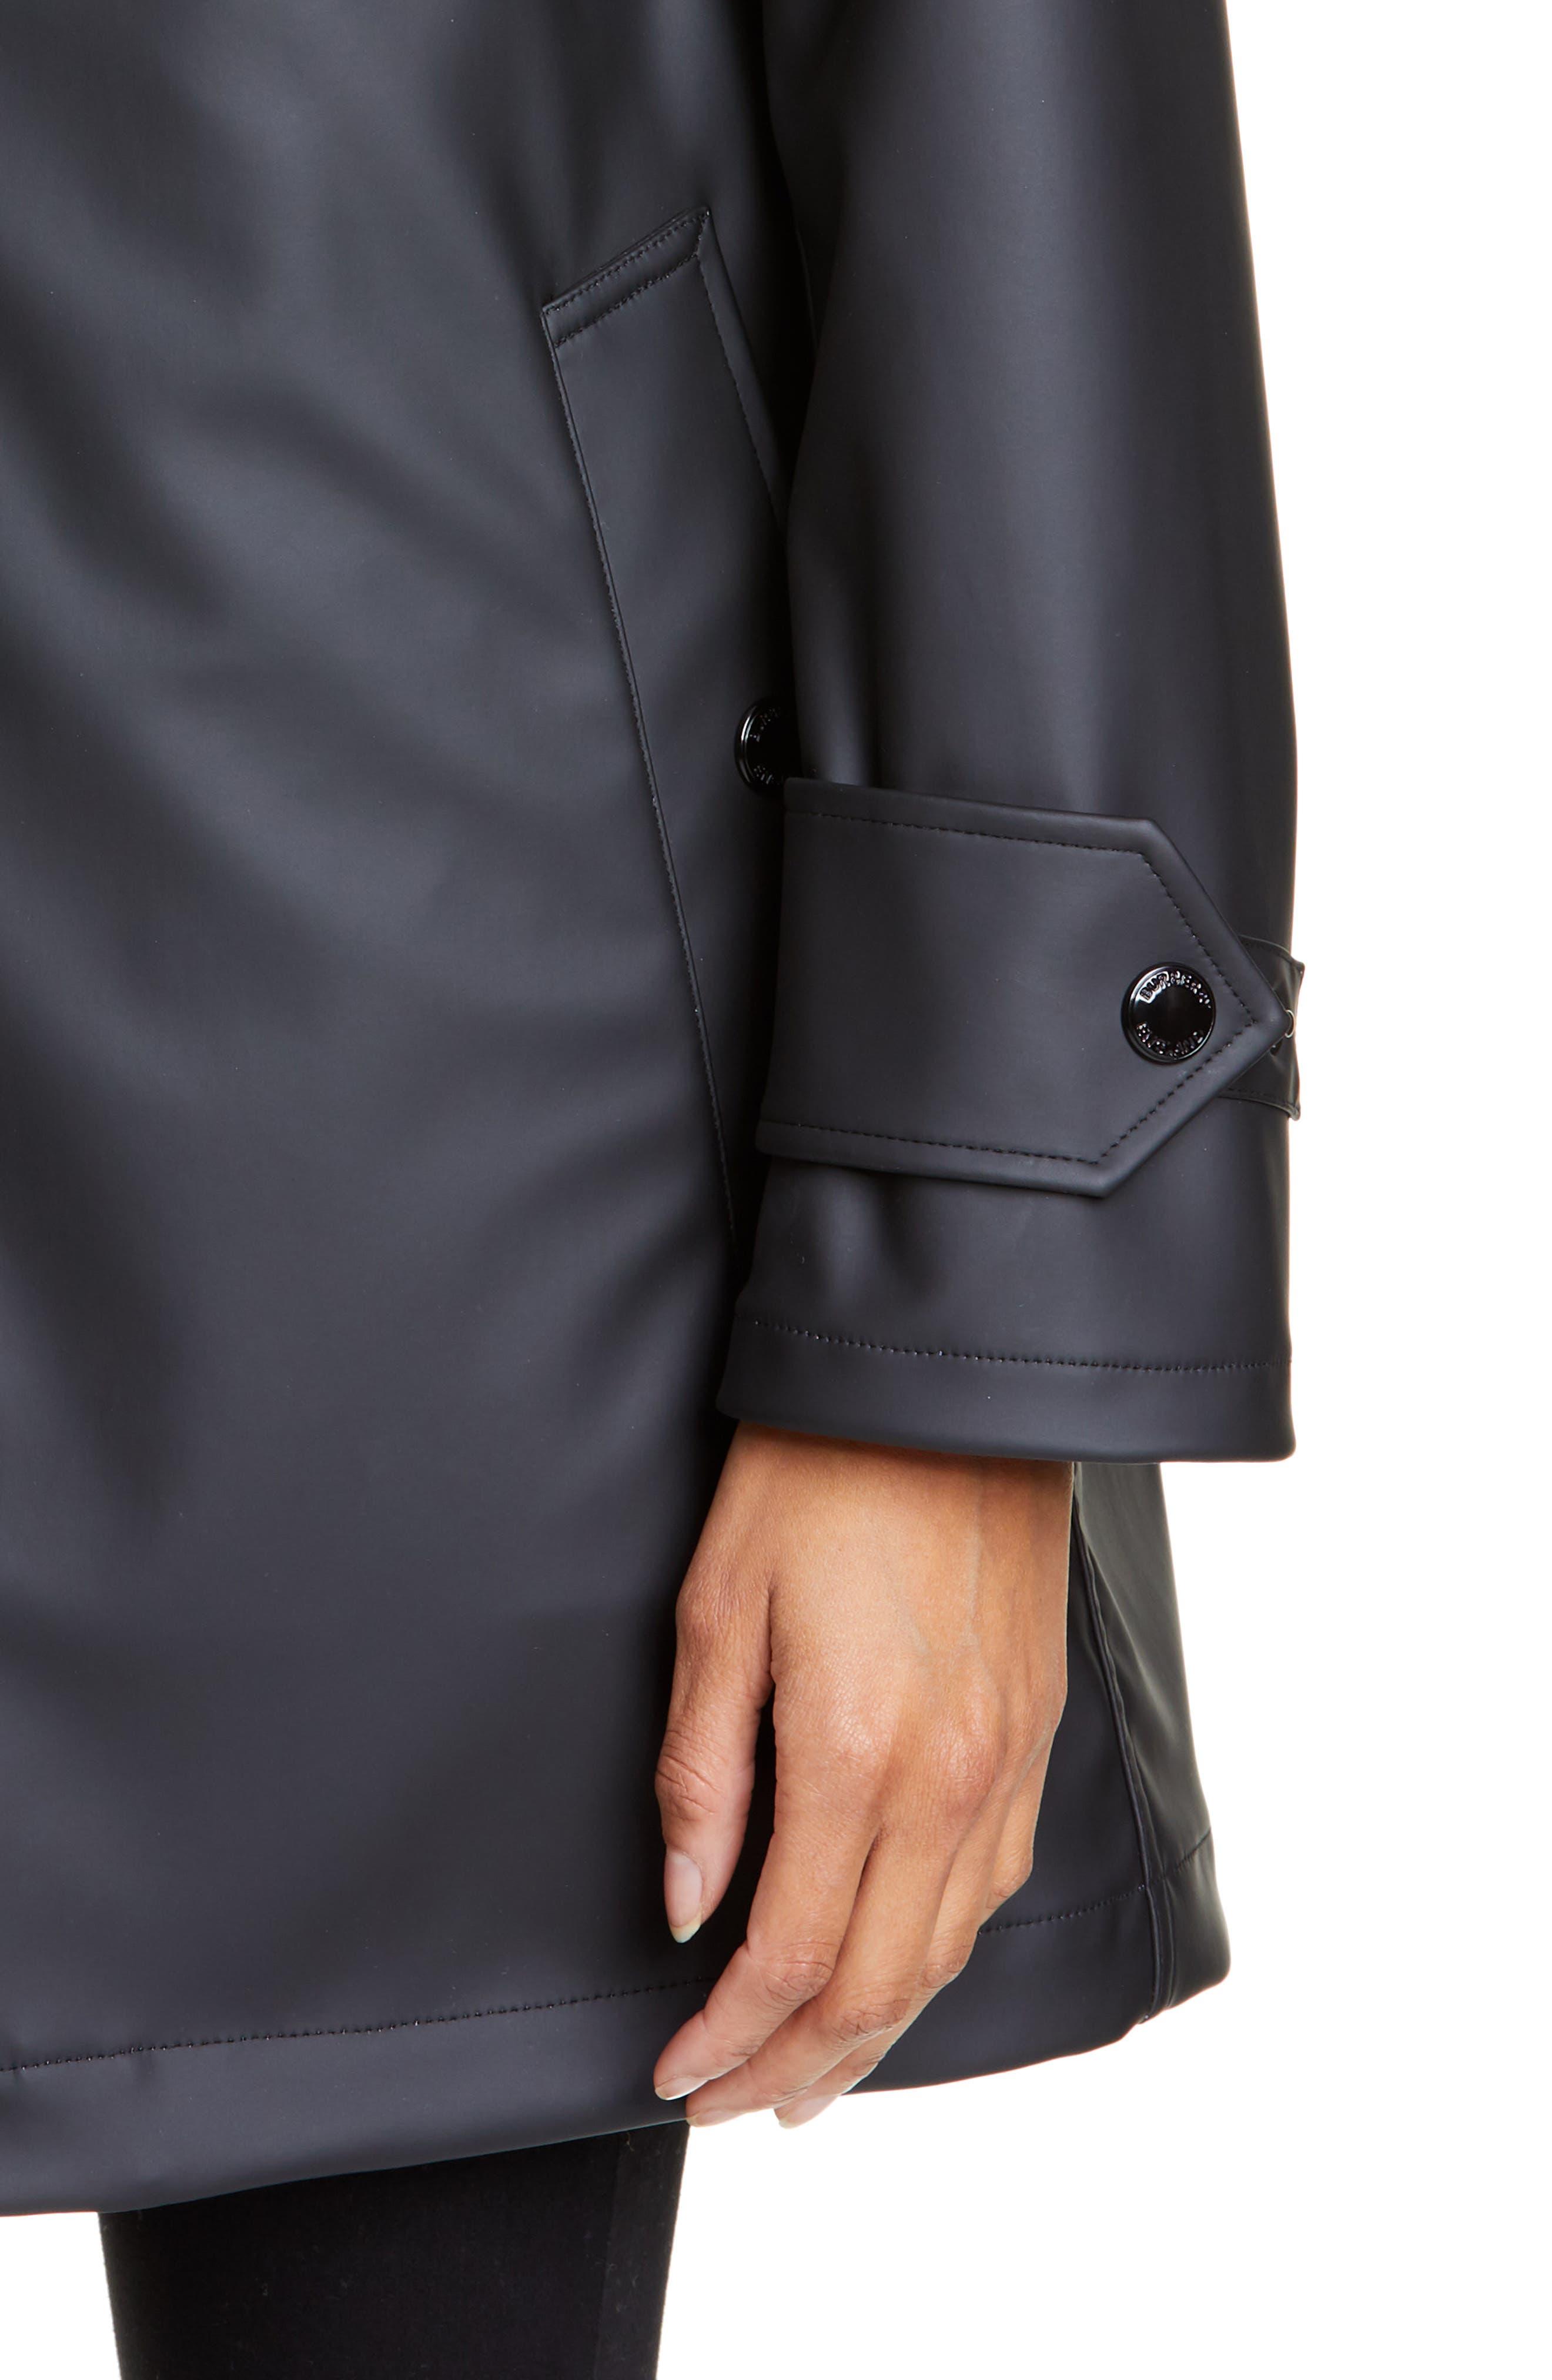 BURBERRY, Hartlebury Coated Rain Coat, Alternate thumbnail 4, color, BLACK / WHITE